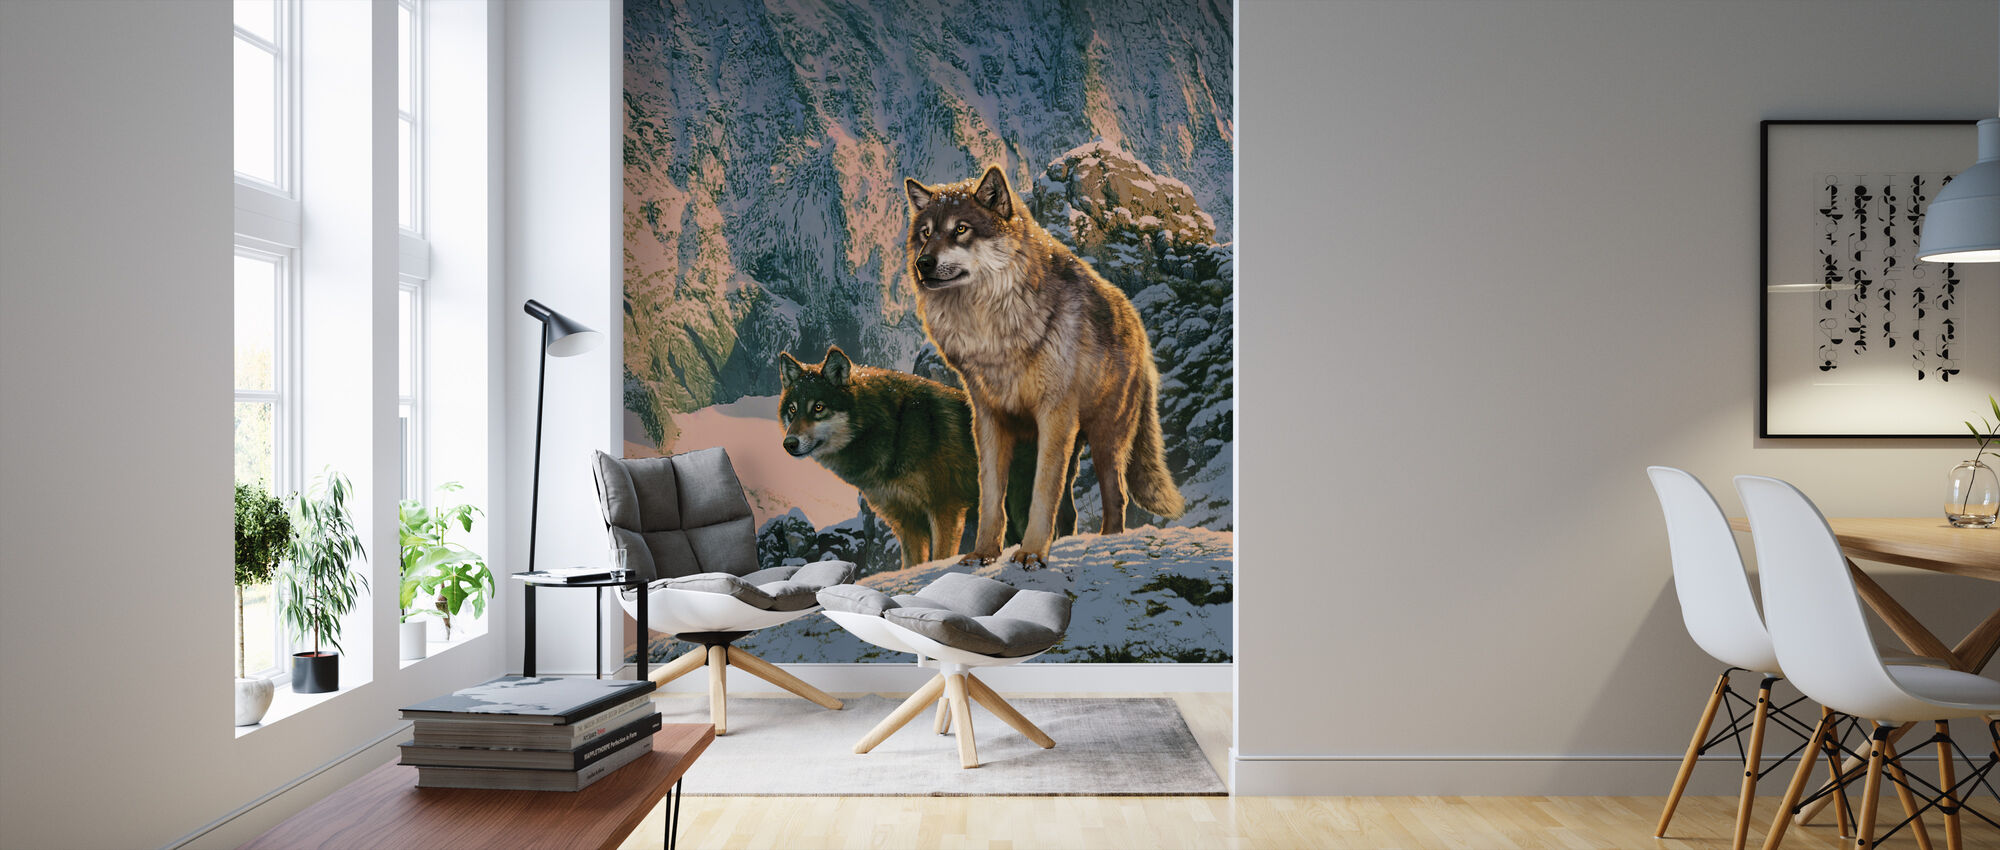 Wolf pari Sunset - Tapetti - Olohuone